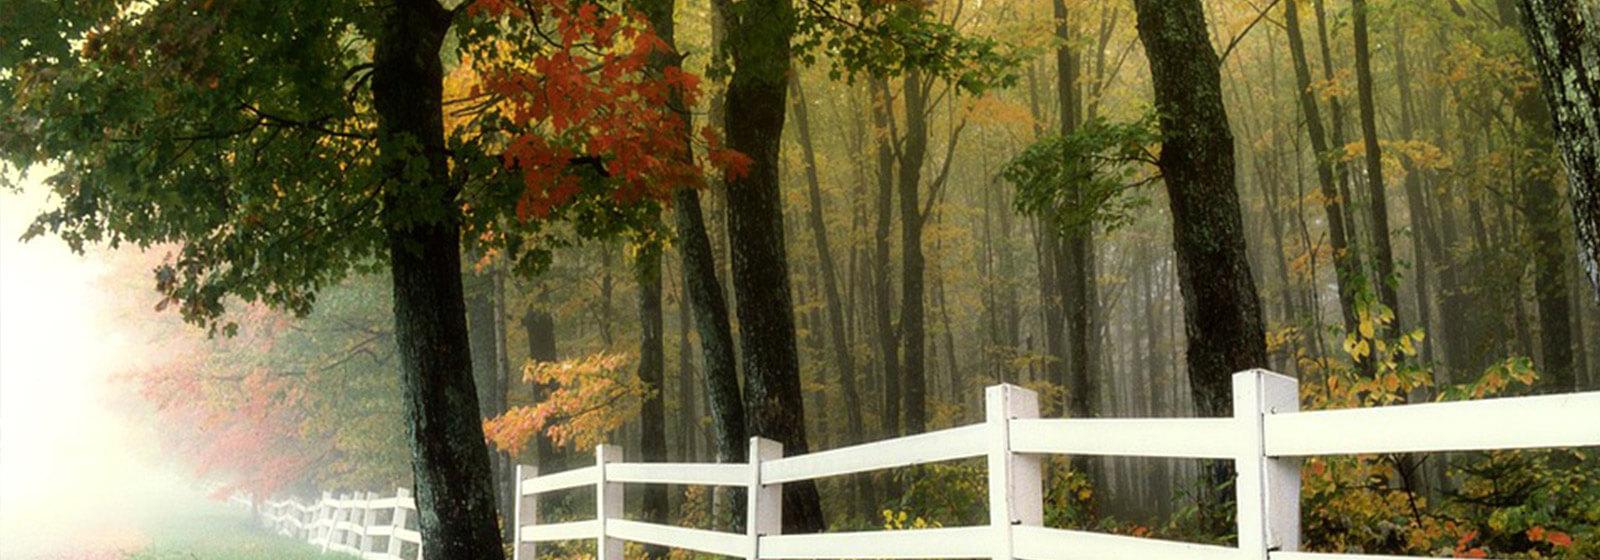 Fall image slide